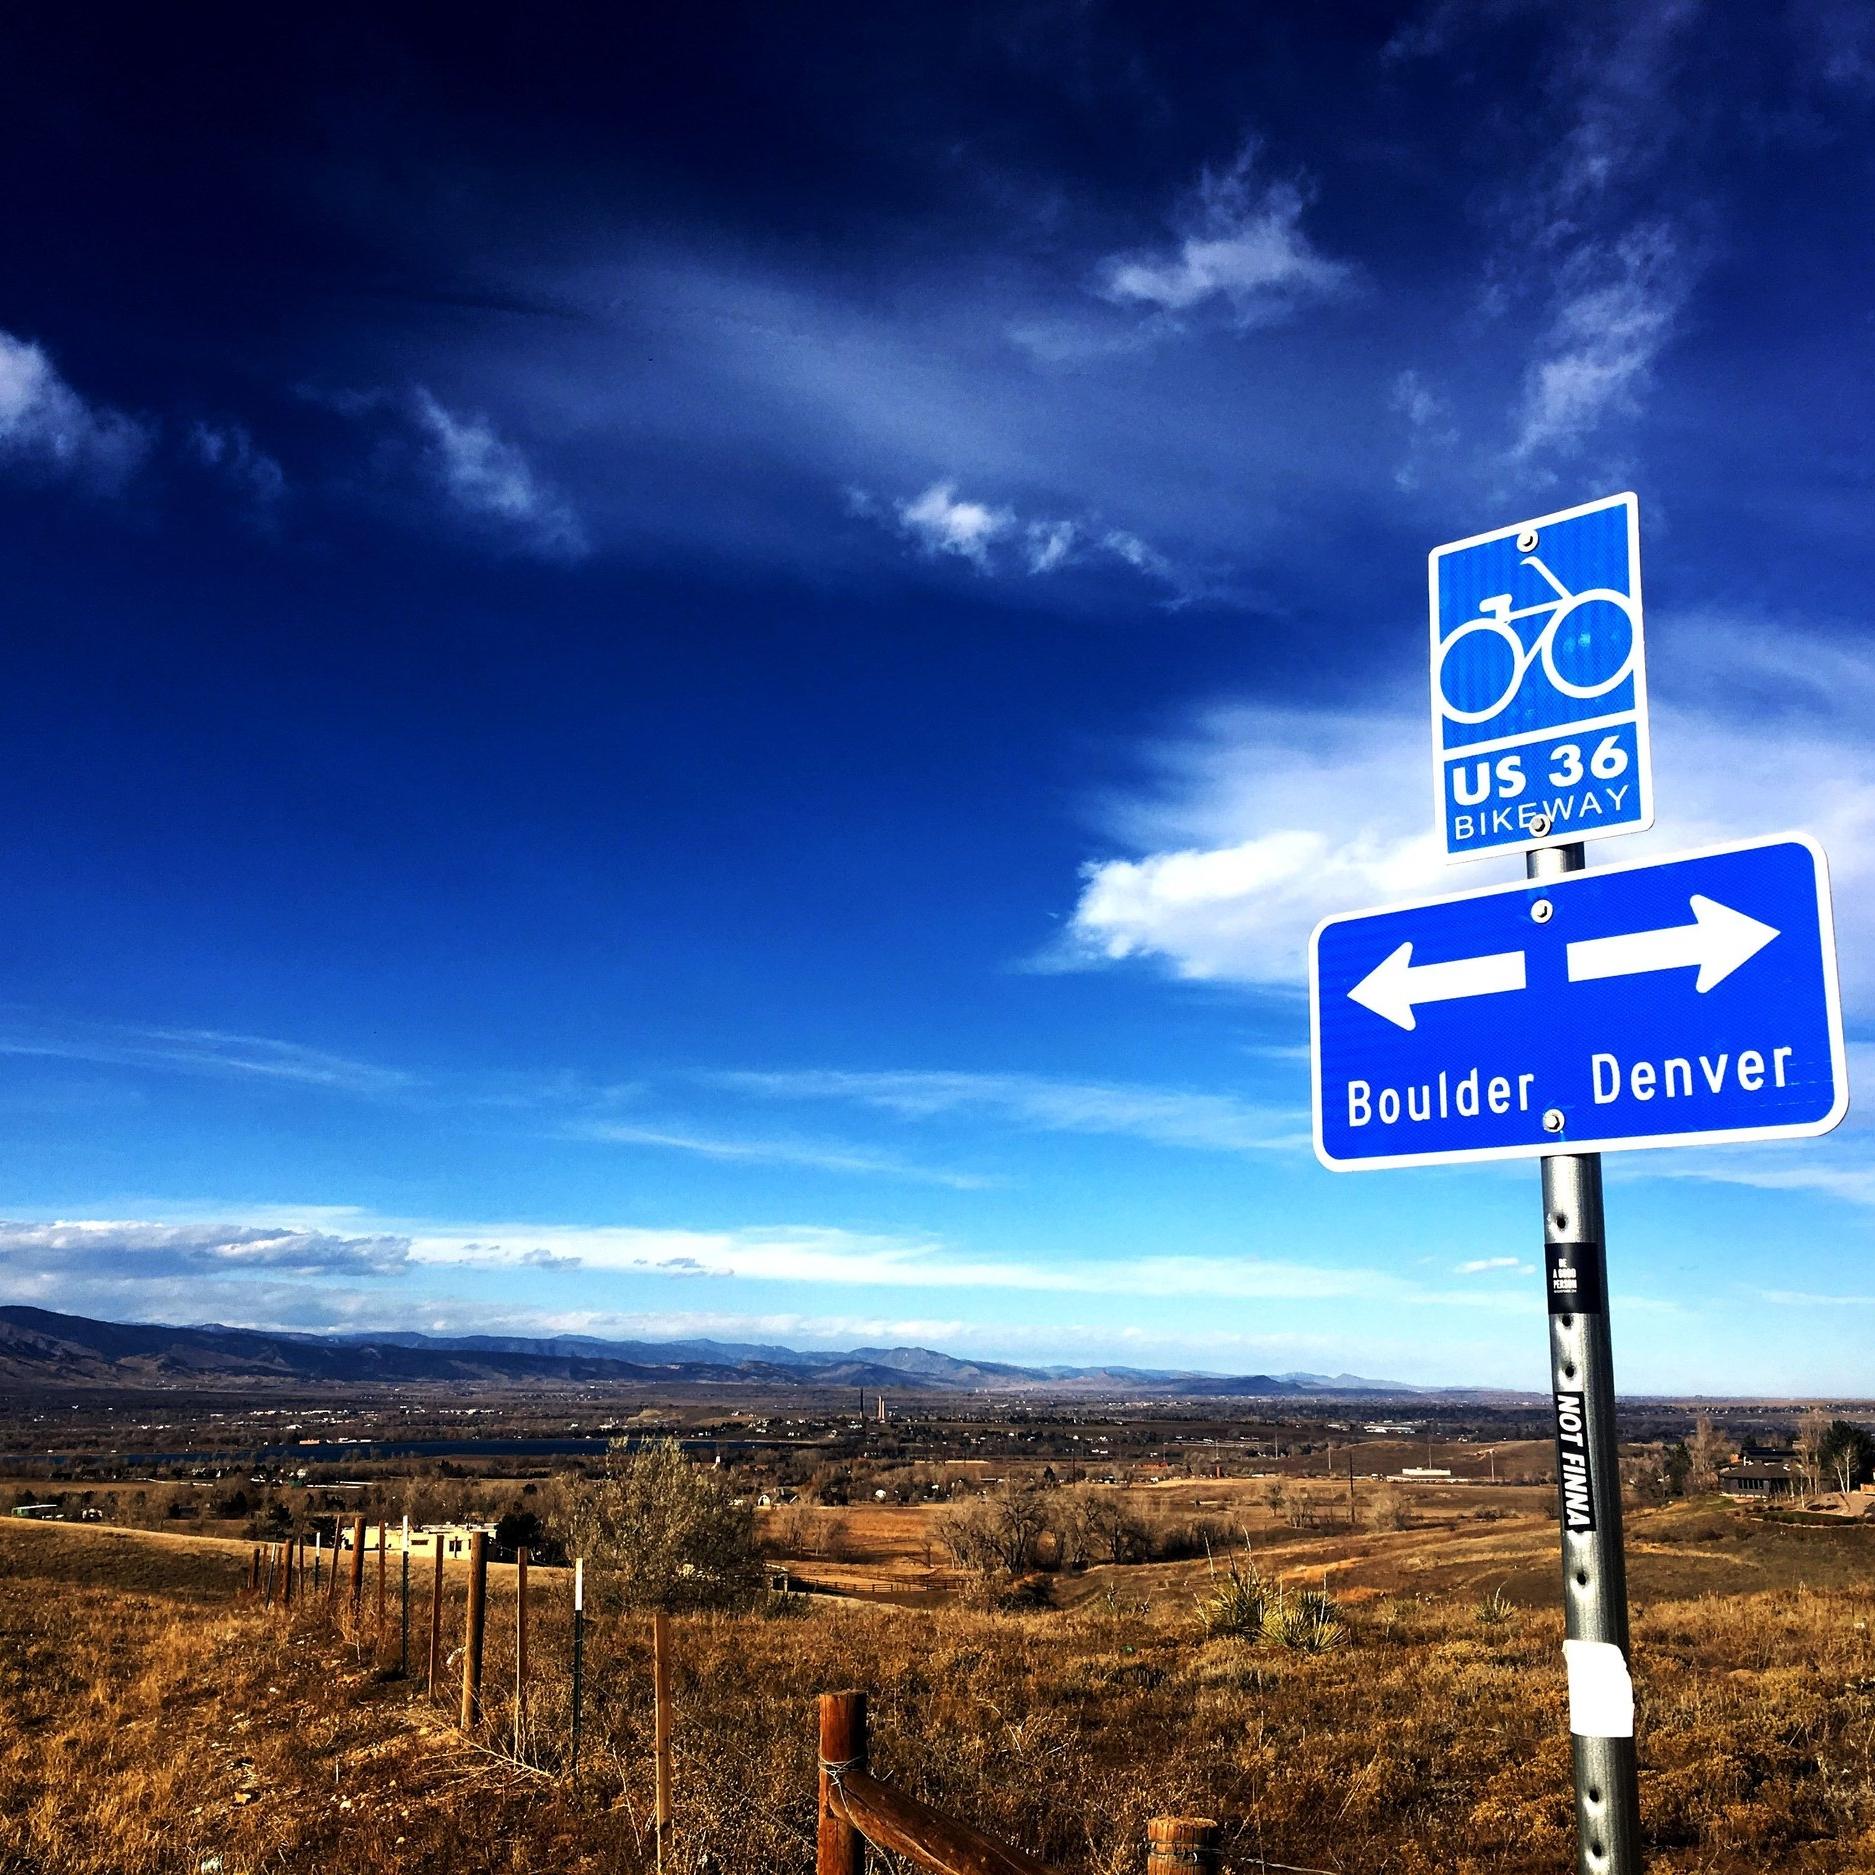 US 36 Bikeway Map